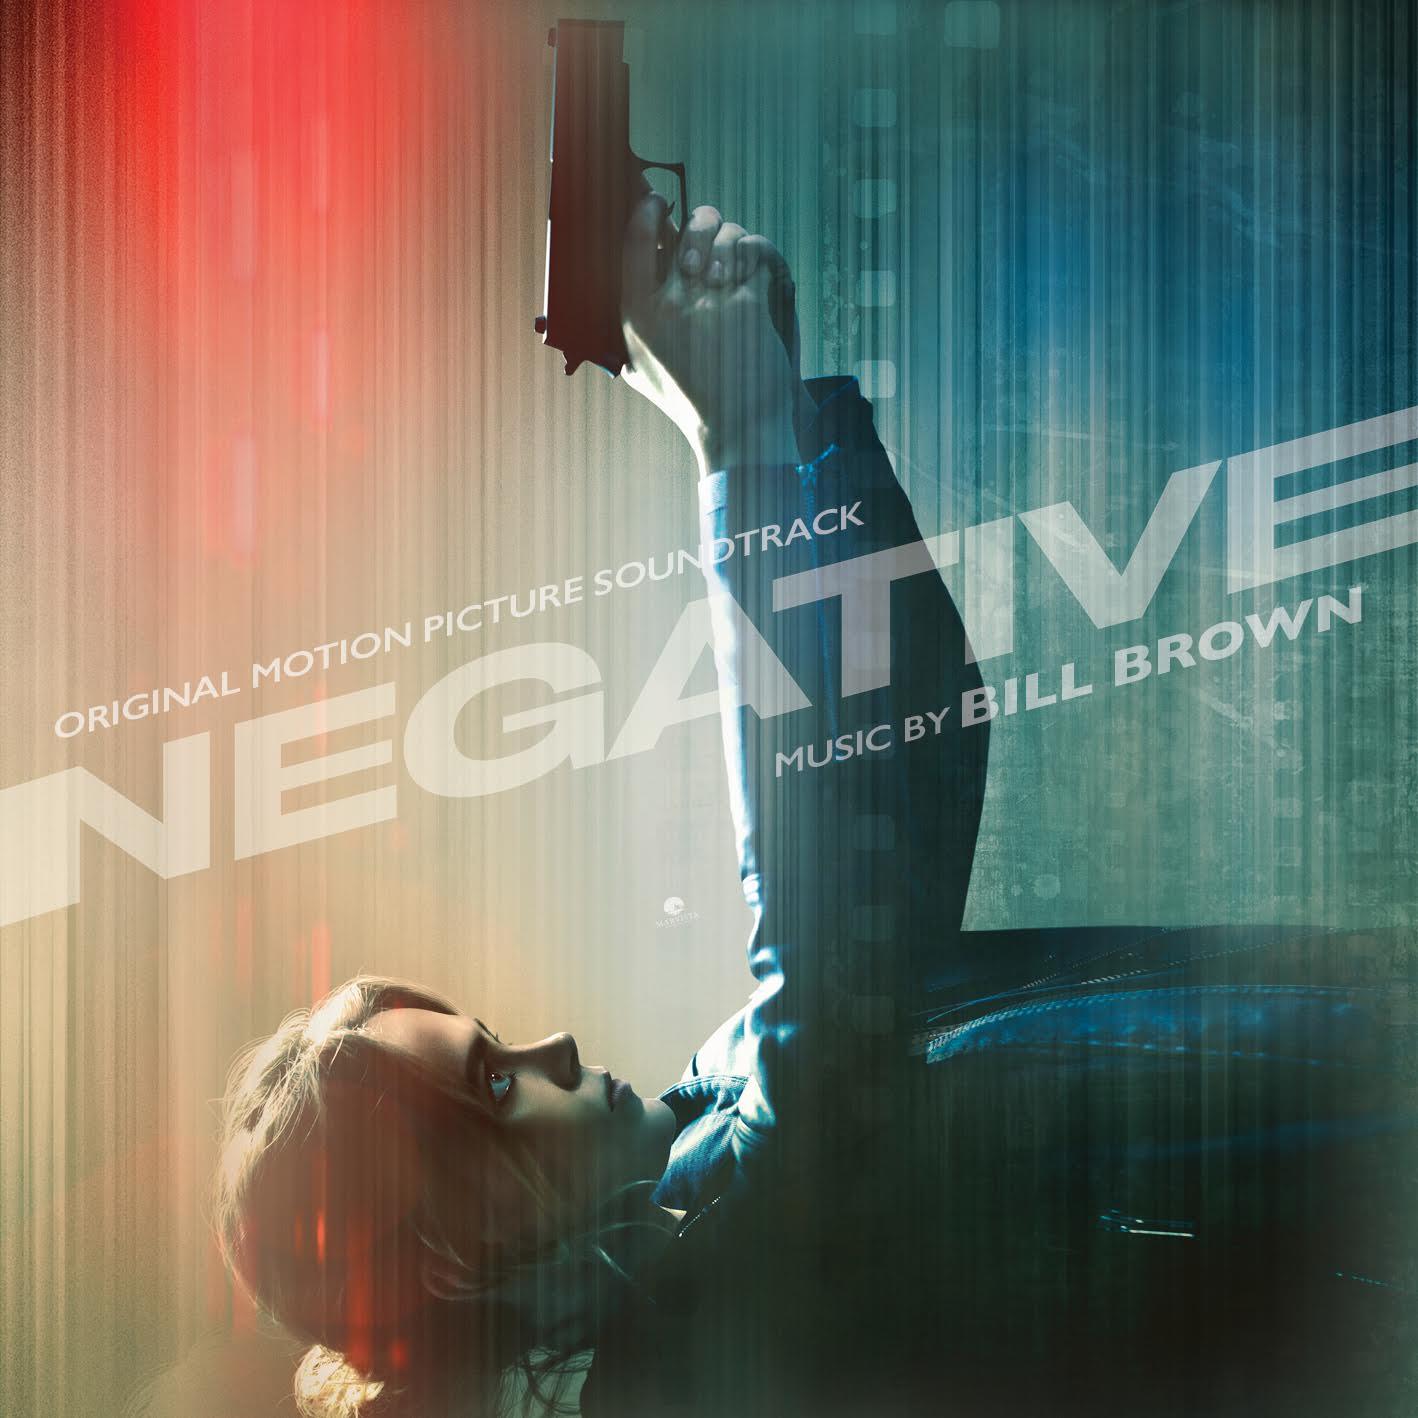 NEGATIVE Motion Picture Soundtrack